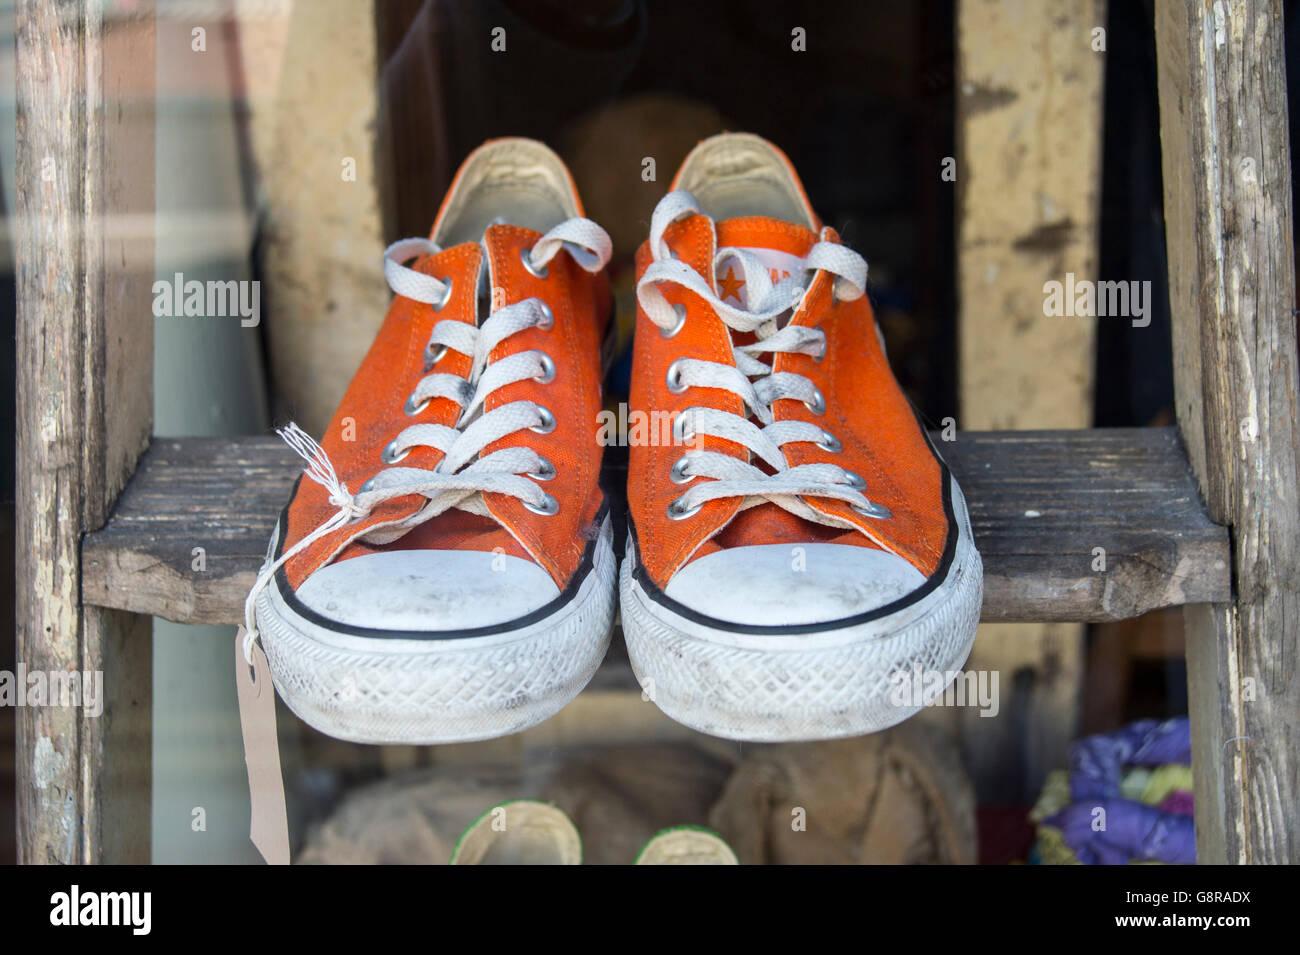 pair of orange converse trainers - Stock Image